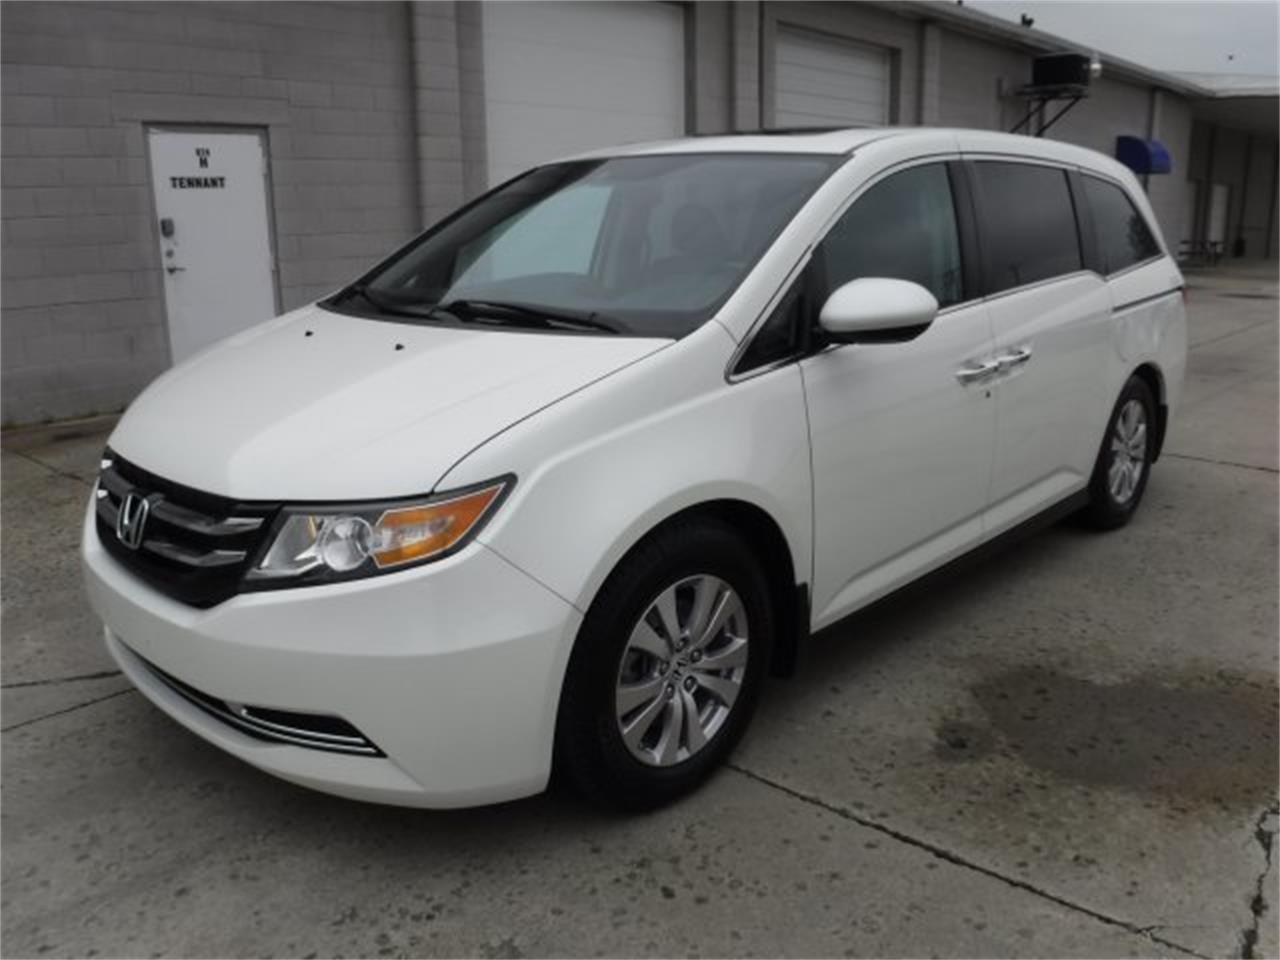 2015 Honda Odyssey (CC-1218314) for sale in Milford, Ohio